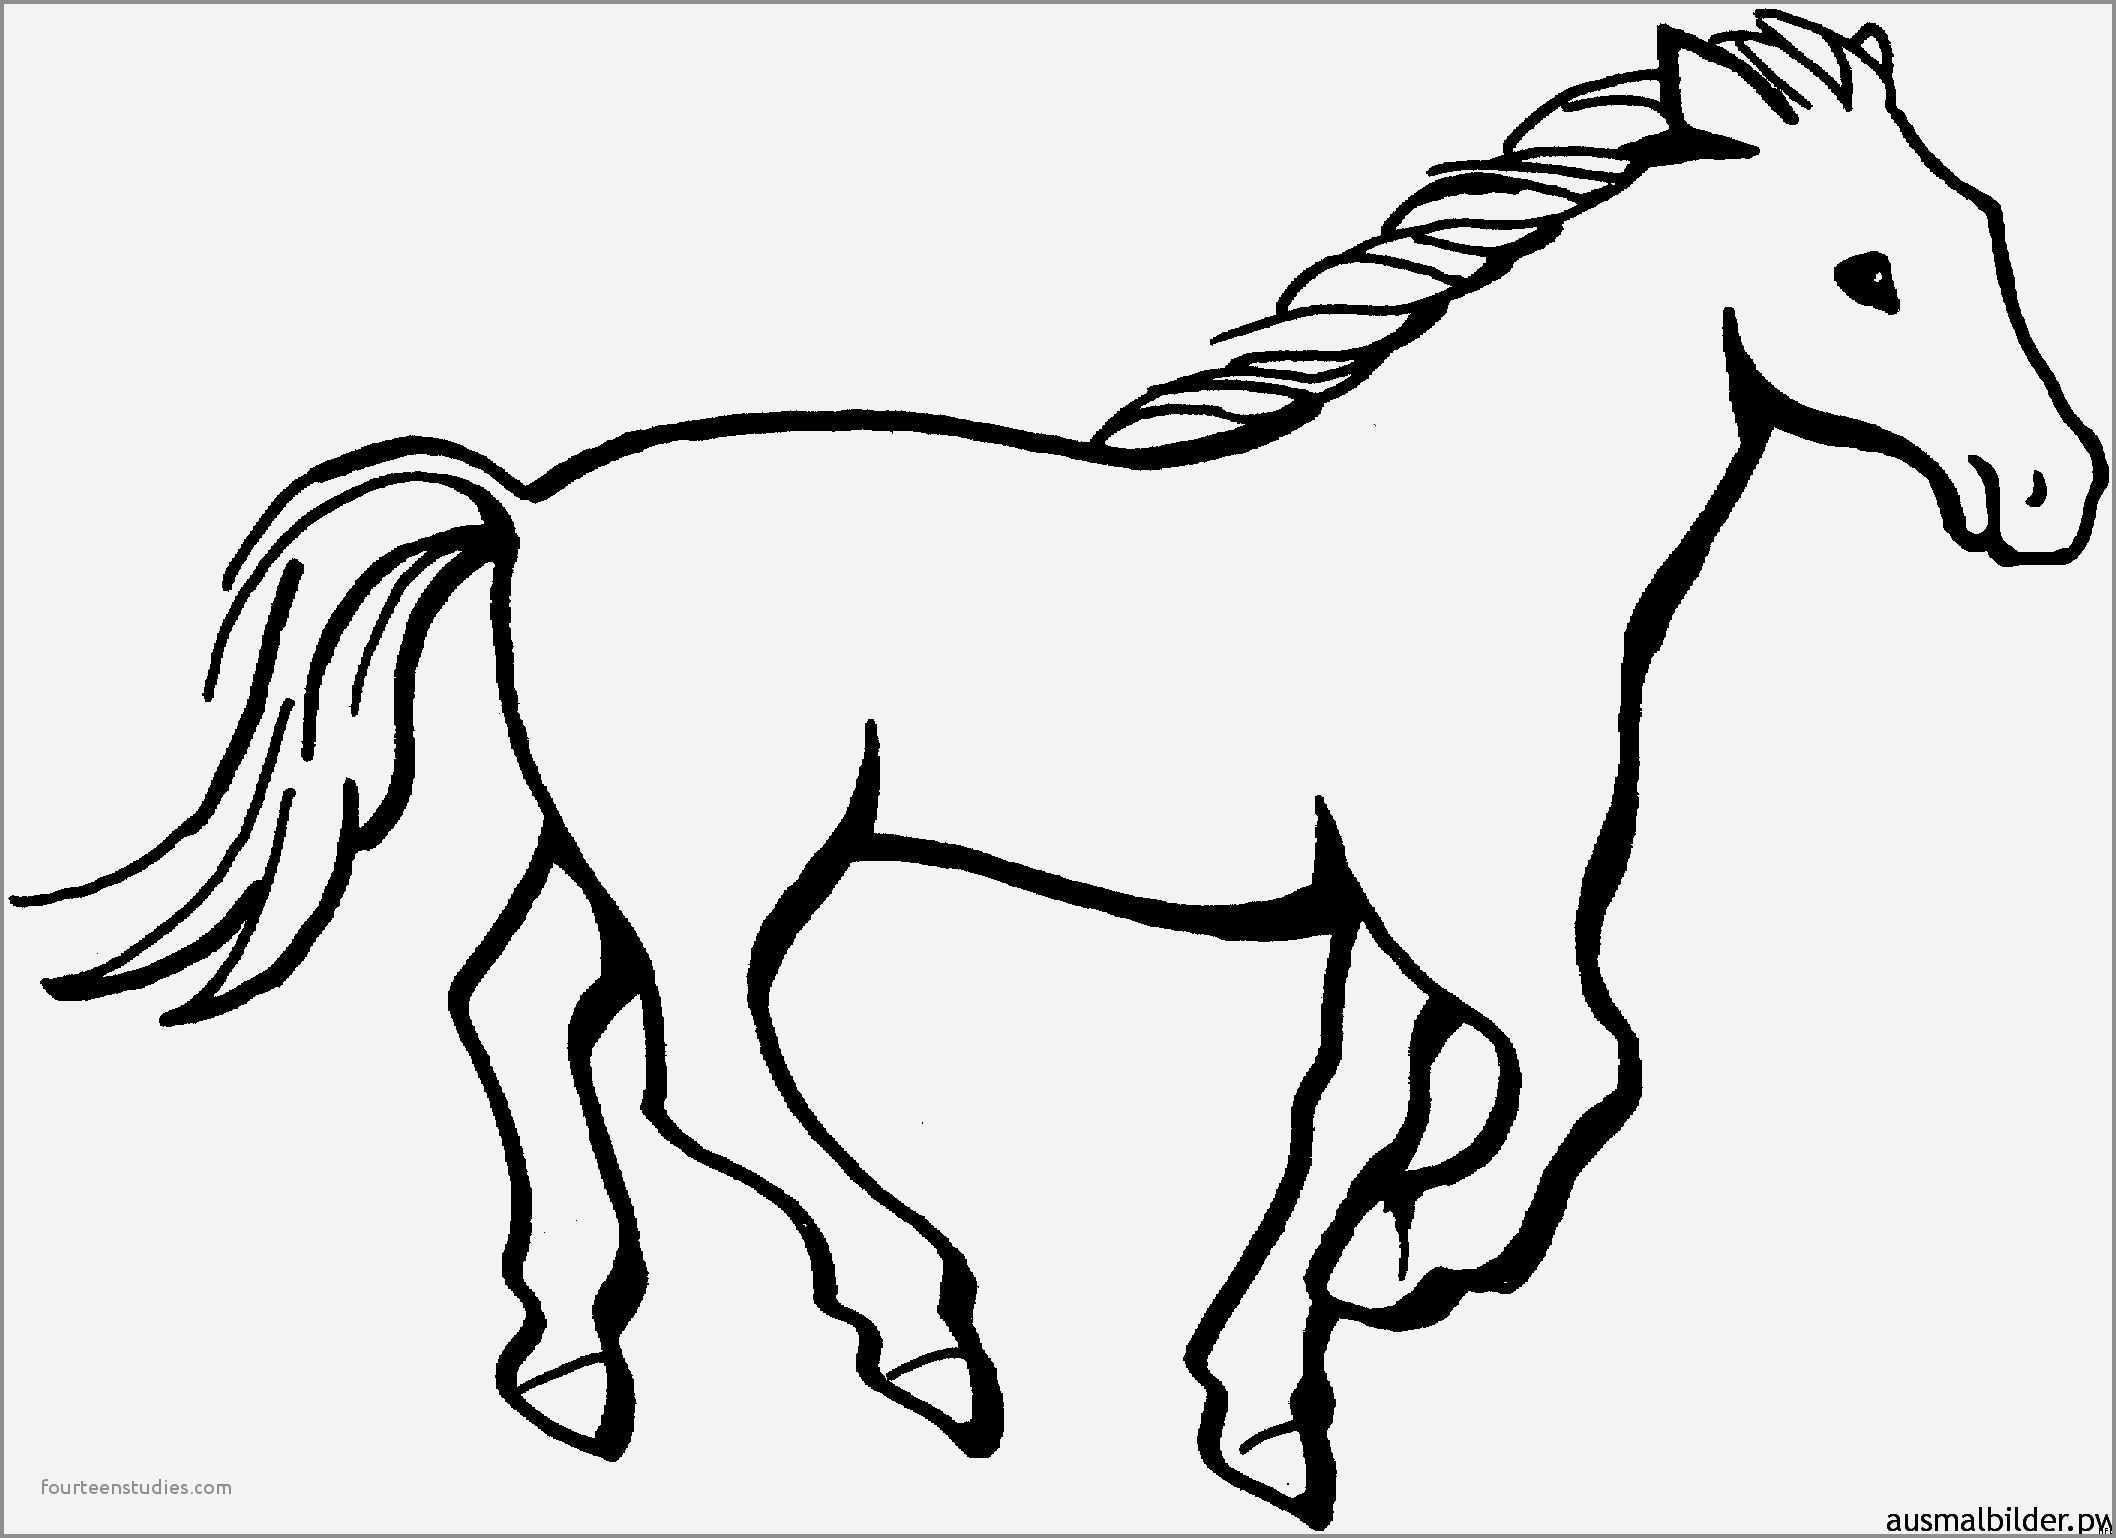 Pferde Ausmalbilder Ausmalbilder Pferde Ausmalbilder Pferde Malvorlagen Pferde Ausmalbilder Tiere